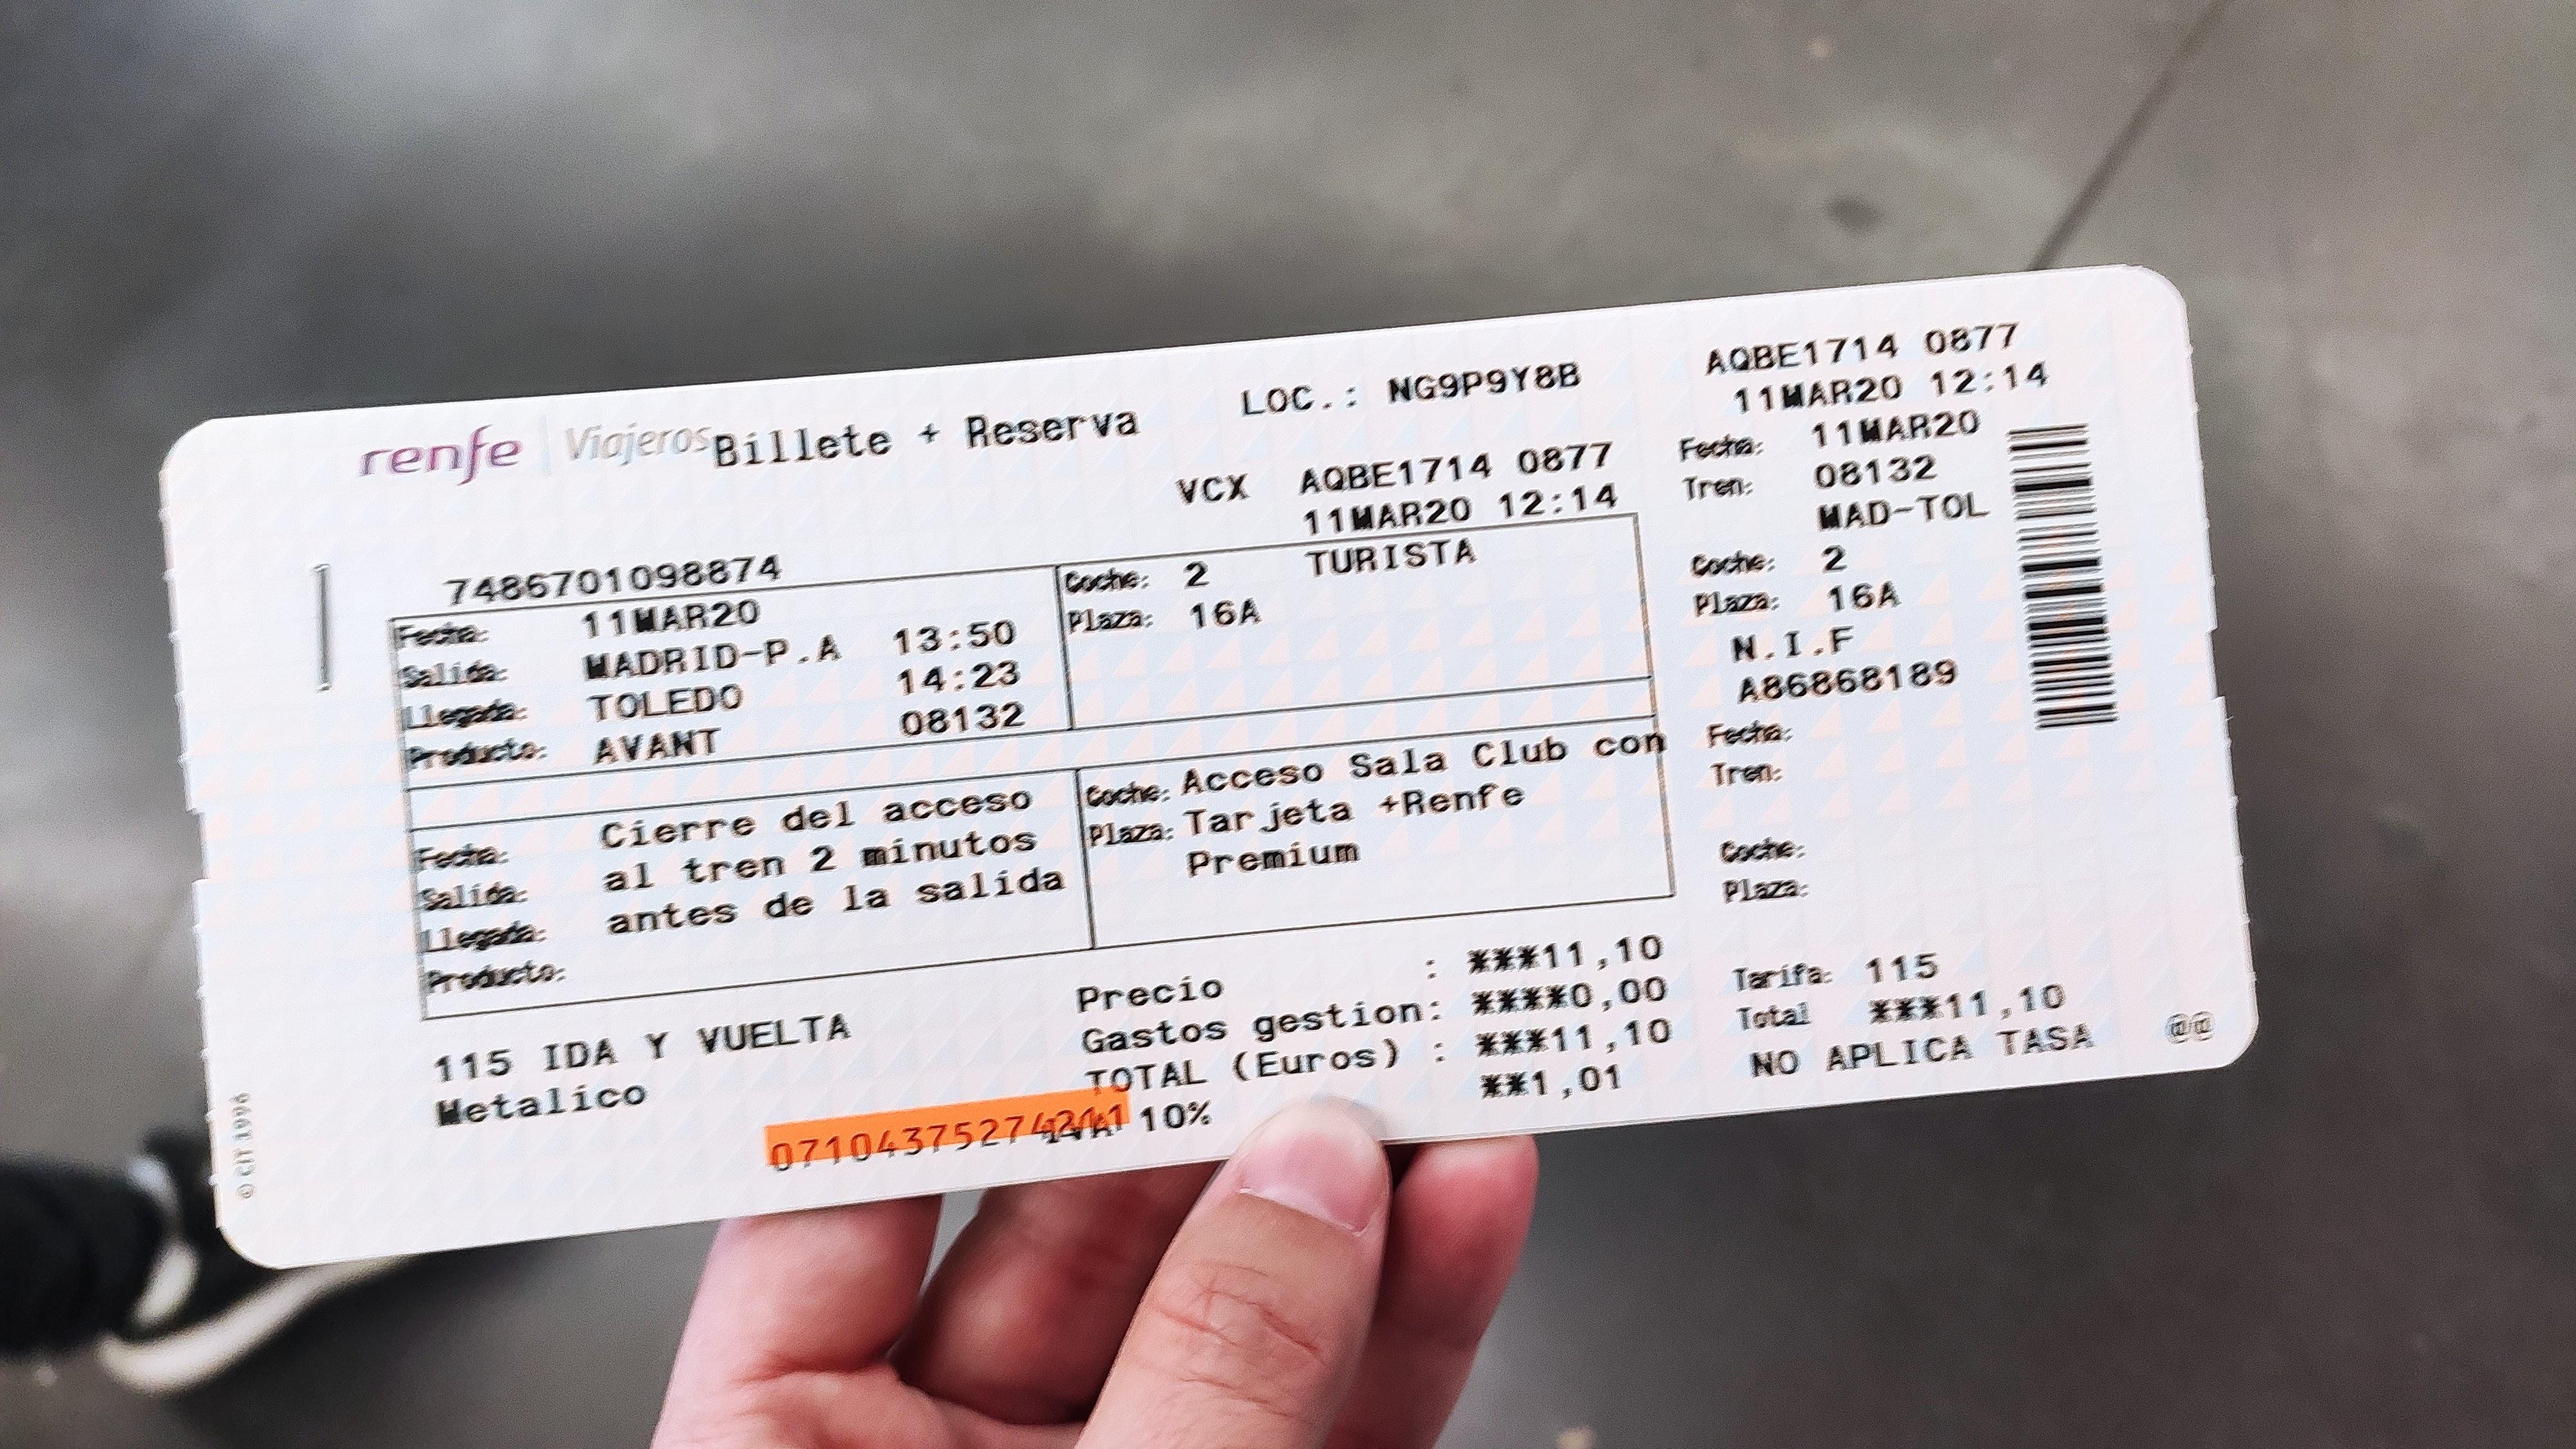 Boleto de tren renfe desde Madrid a Toledo de 11,10 euros cada tramo.